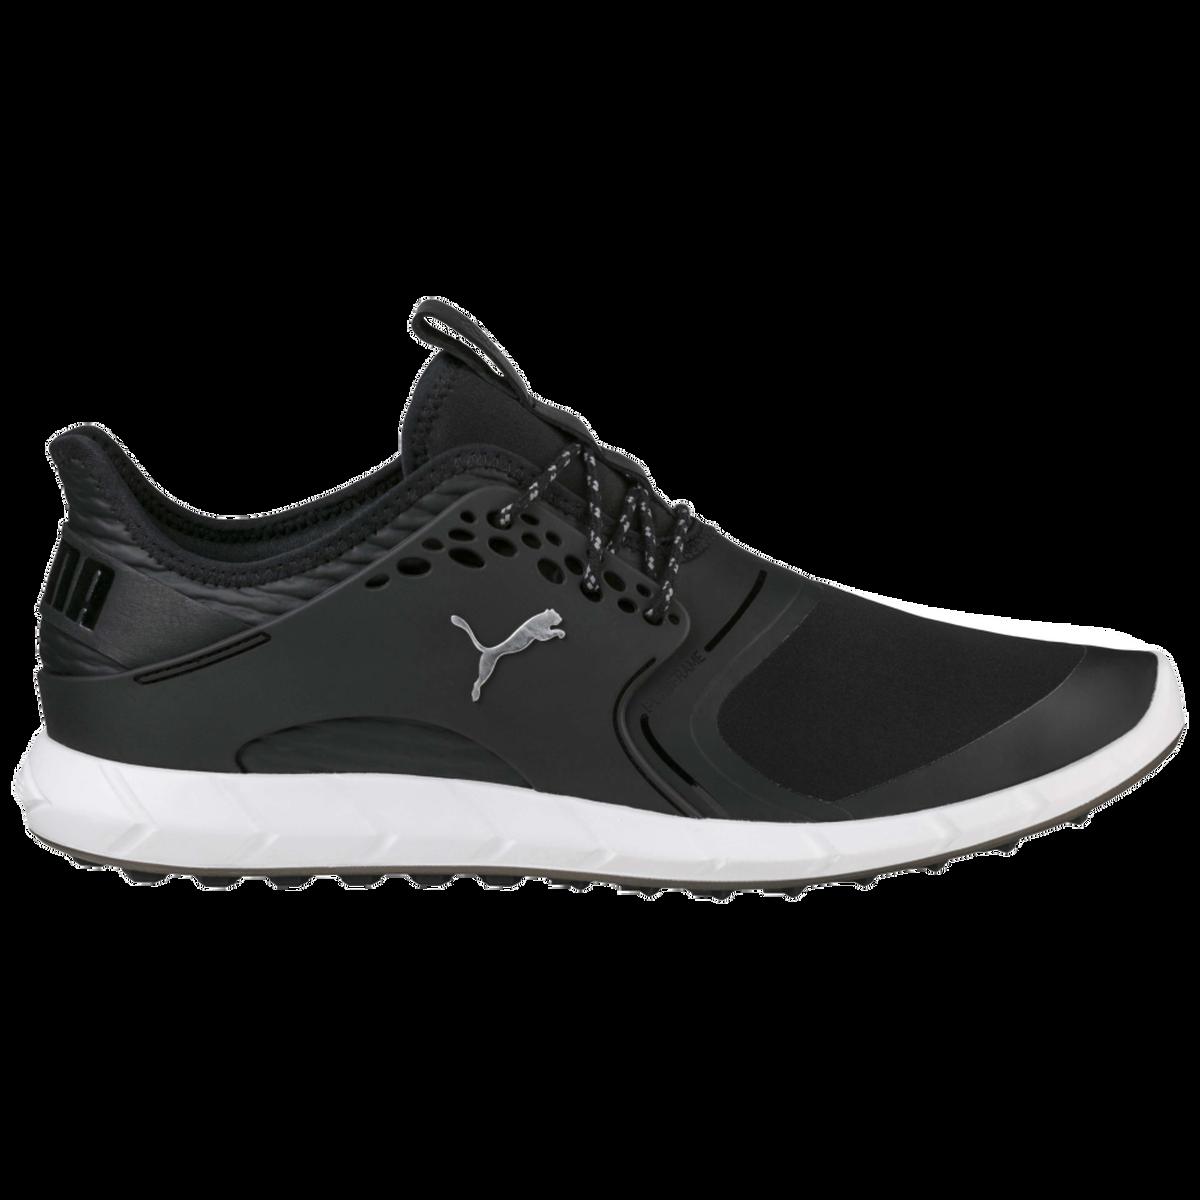 76e156eecdf PUMA IGNITE PWRSPORT Men s Golf Shoe - Black Silver